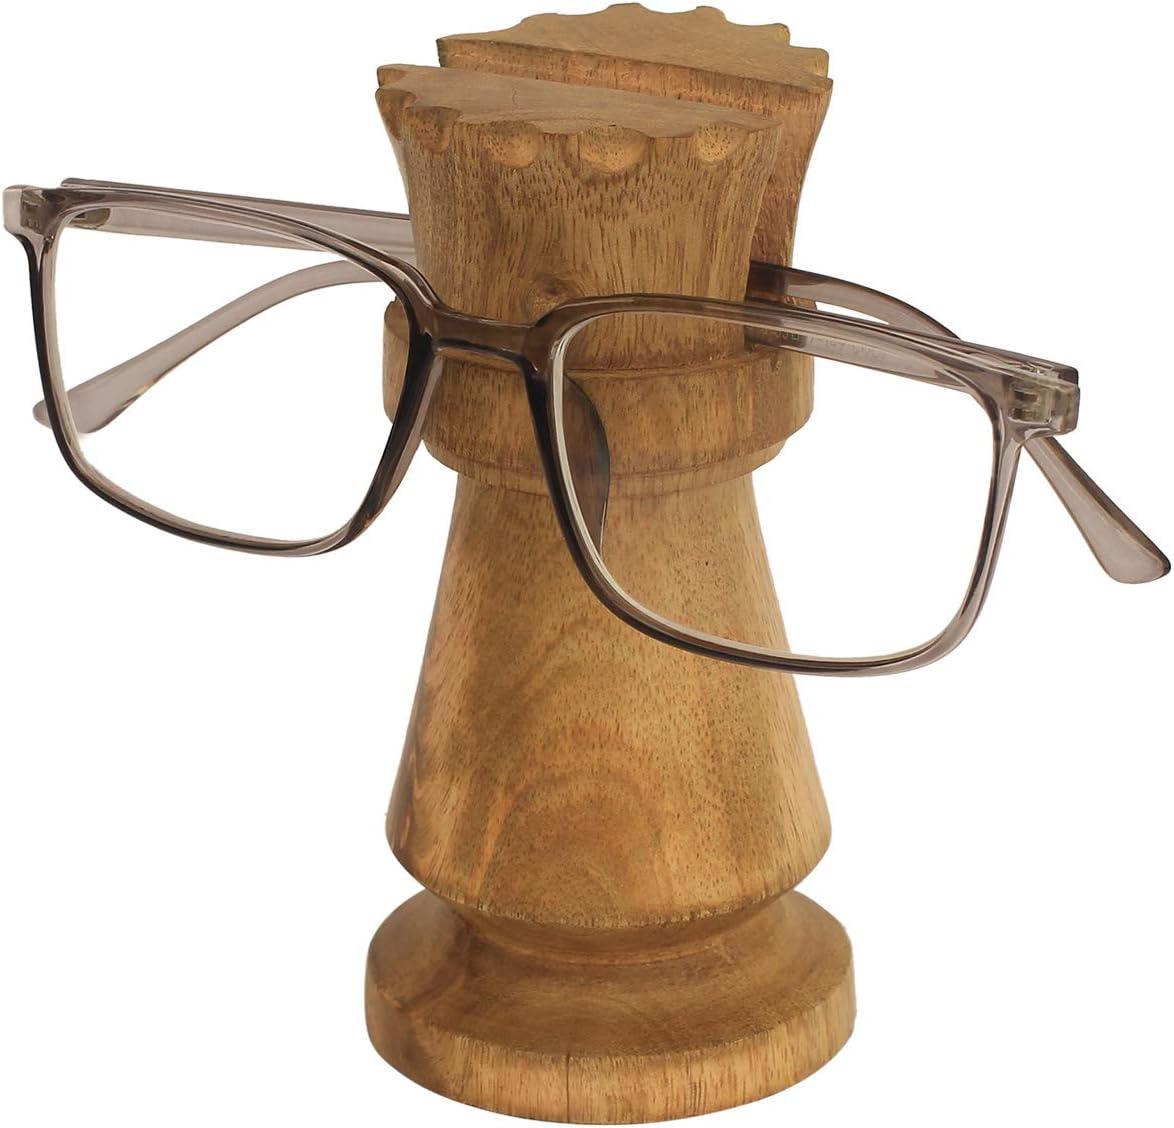 CRAFKART Chess Set Queen Spectacle Holder - Best Buy Queen Spectacle Holder Wooden Eyeglass Stand Handmade Display Optical Glasses Accessories